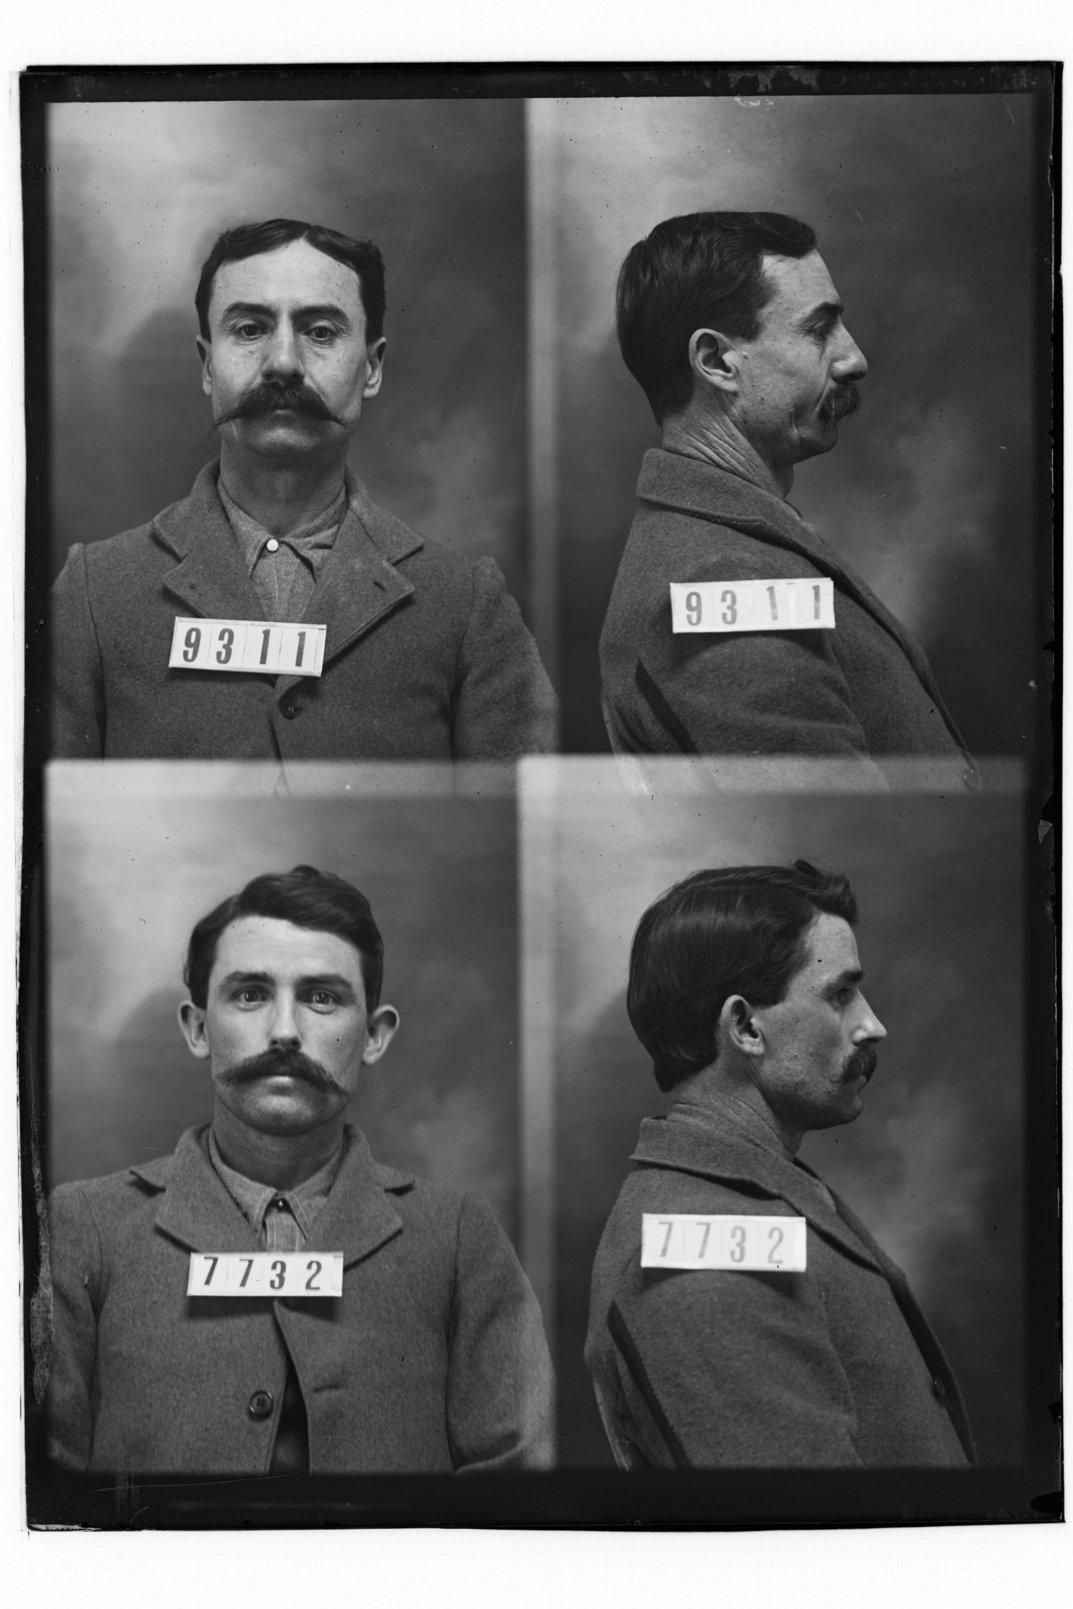 A. J. Stinnett and George Stevens, prisoners 9311 and 7732